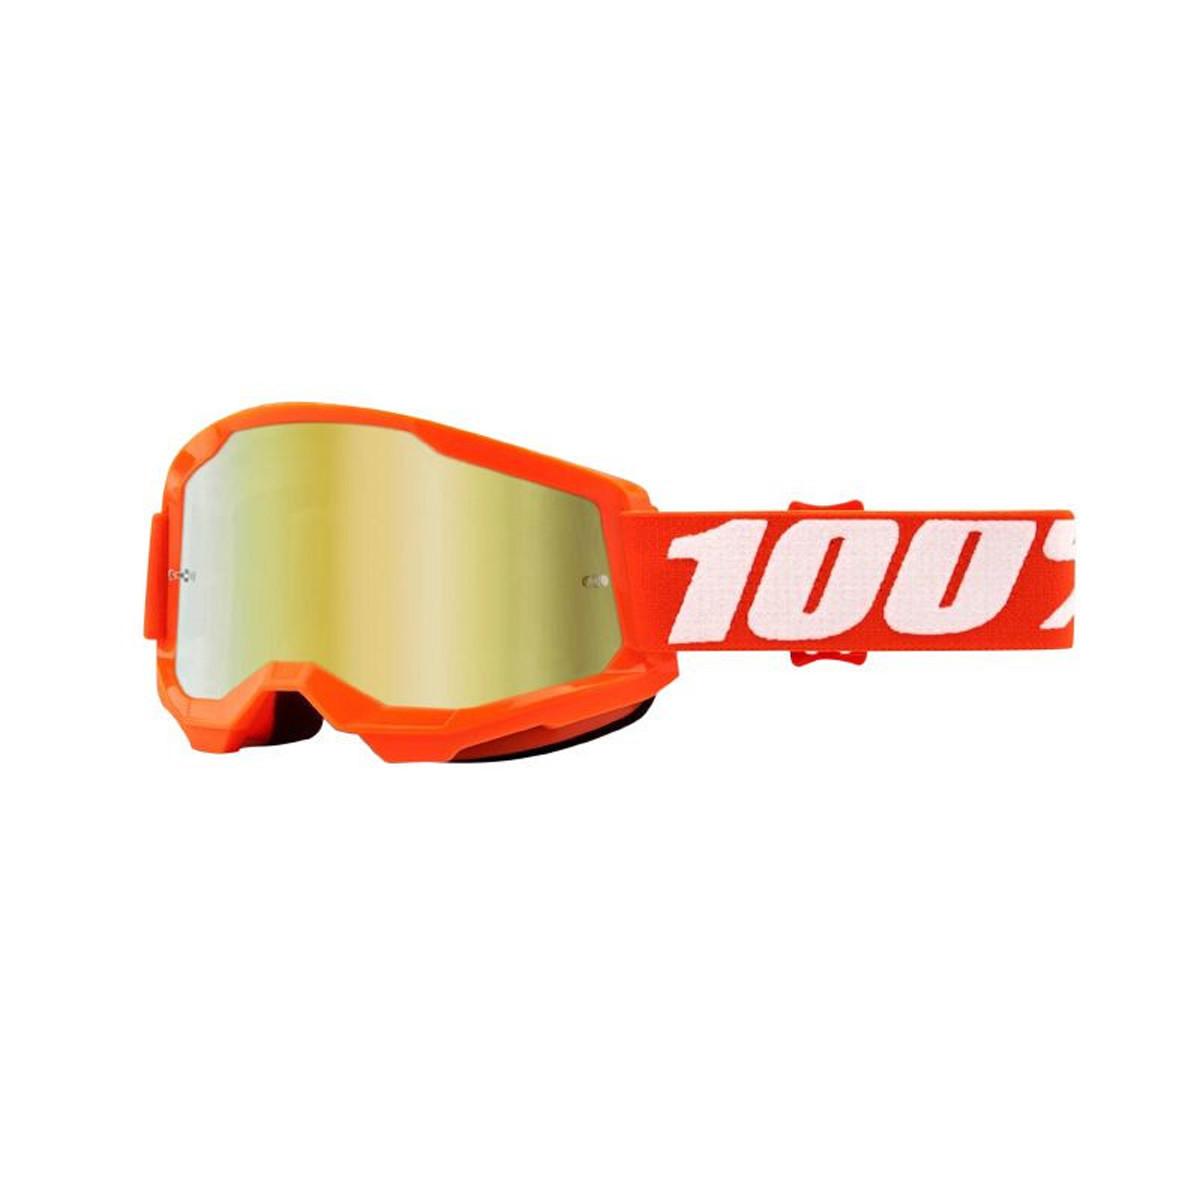 Masque / Lunettes Cross - 100% Strata 2 Essentiel Orange Ecran Miroir